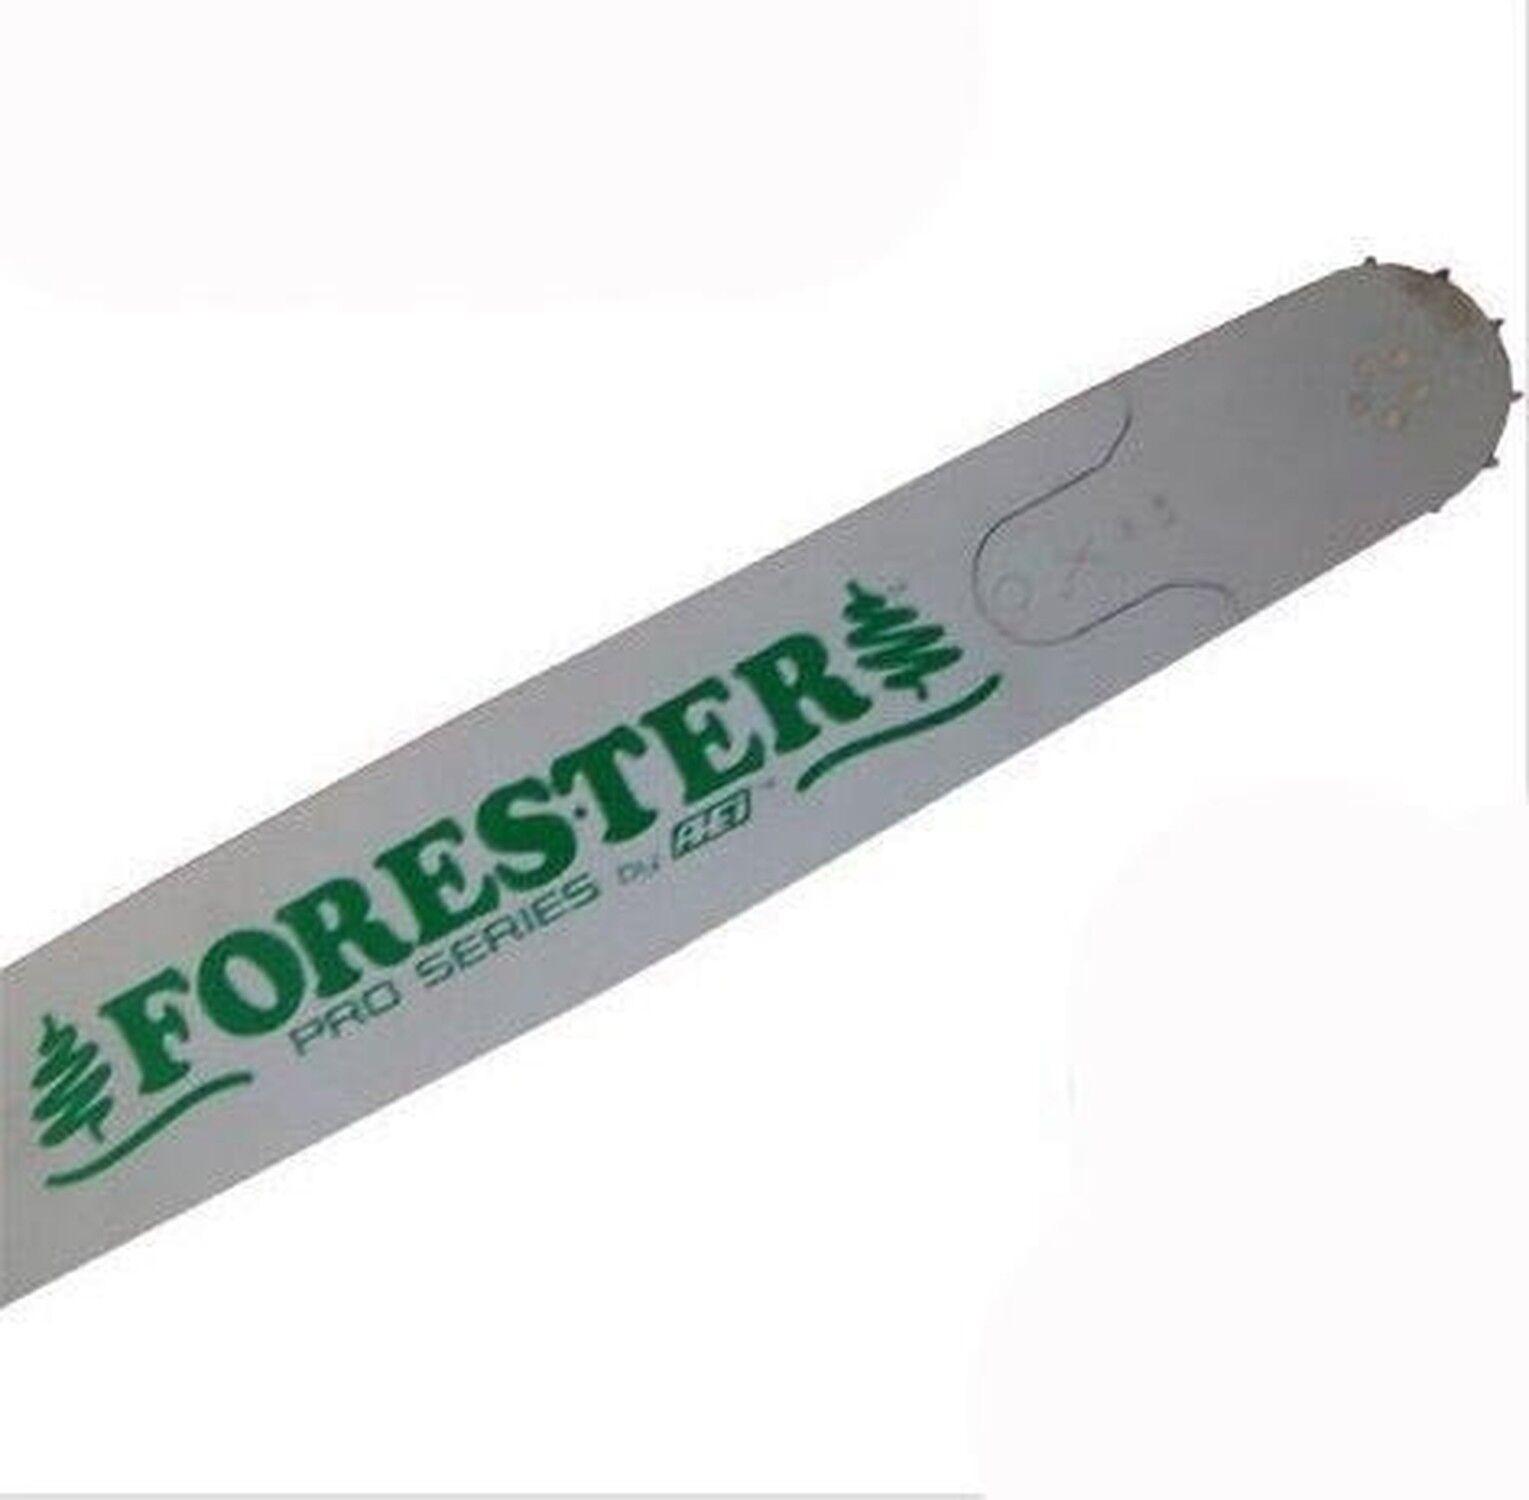 FORESTER 25  .050 3 8  CHAINSAW BAR para Stihl D025